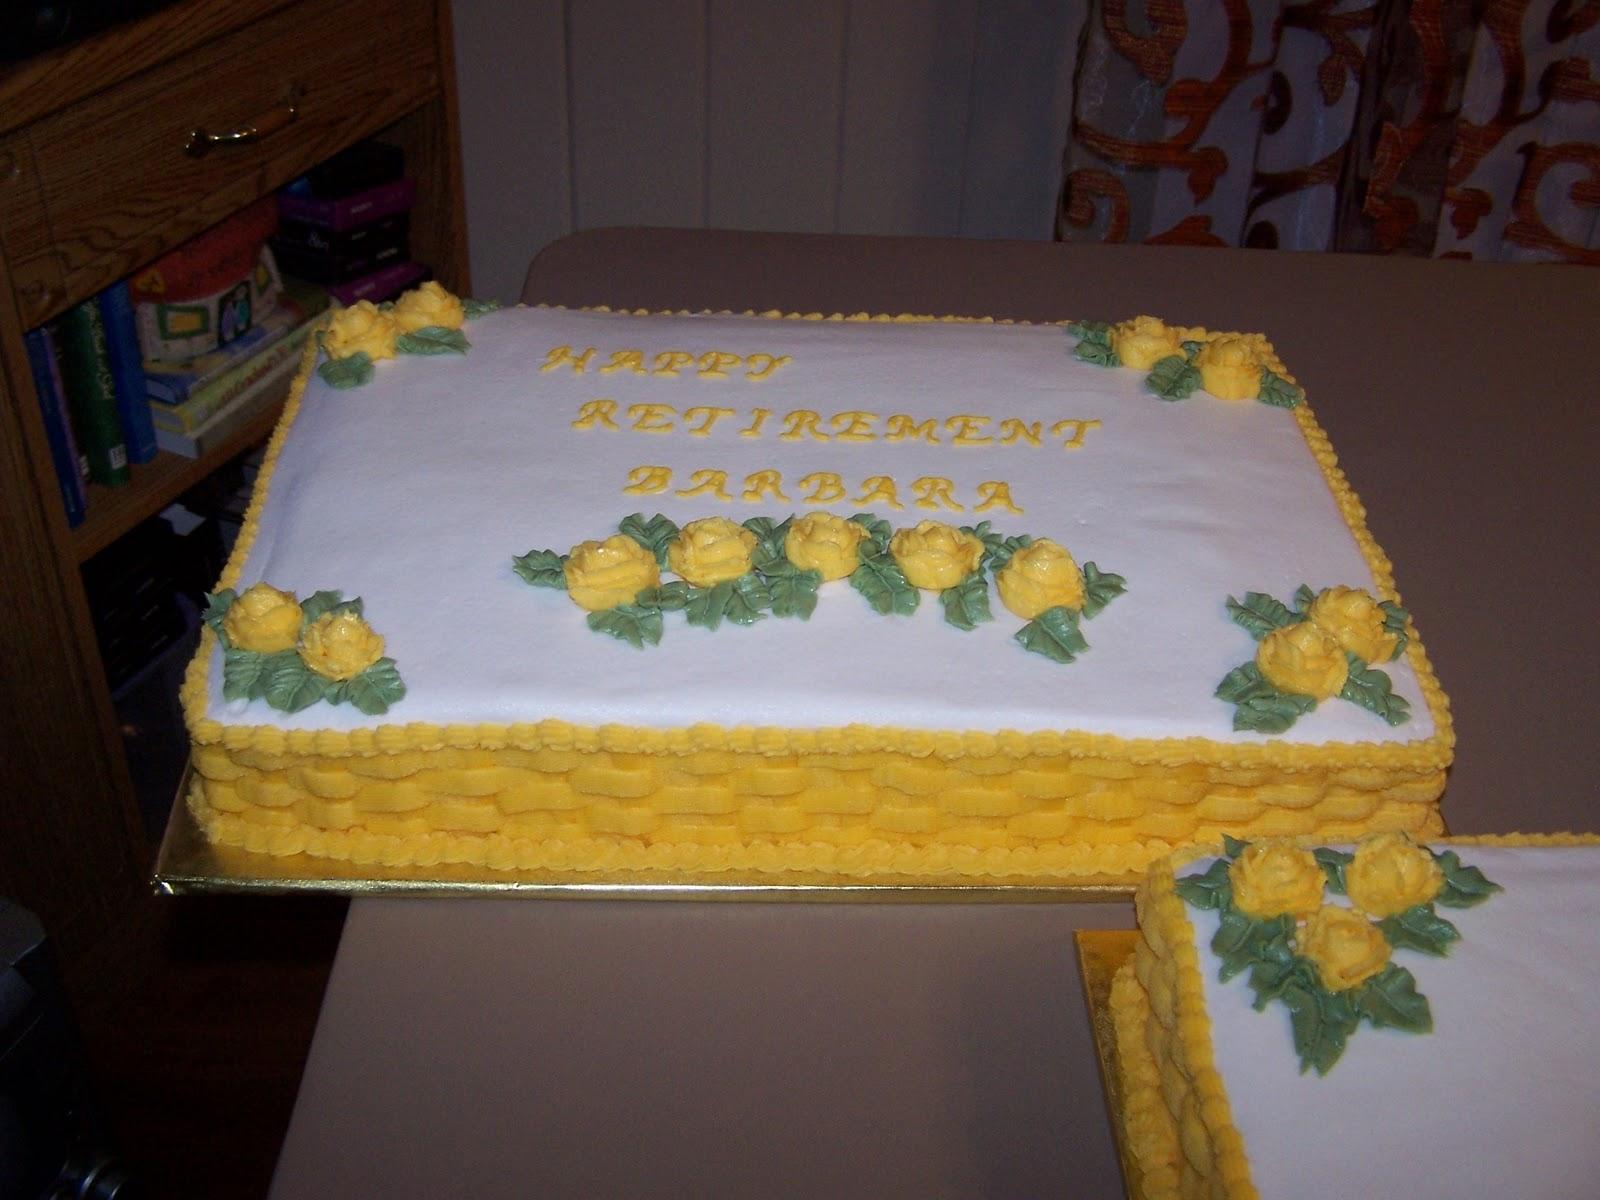 Cake Decoration Quotes : Quotes About Cake Decorating. QuotesGram